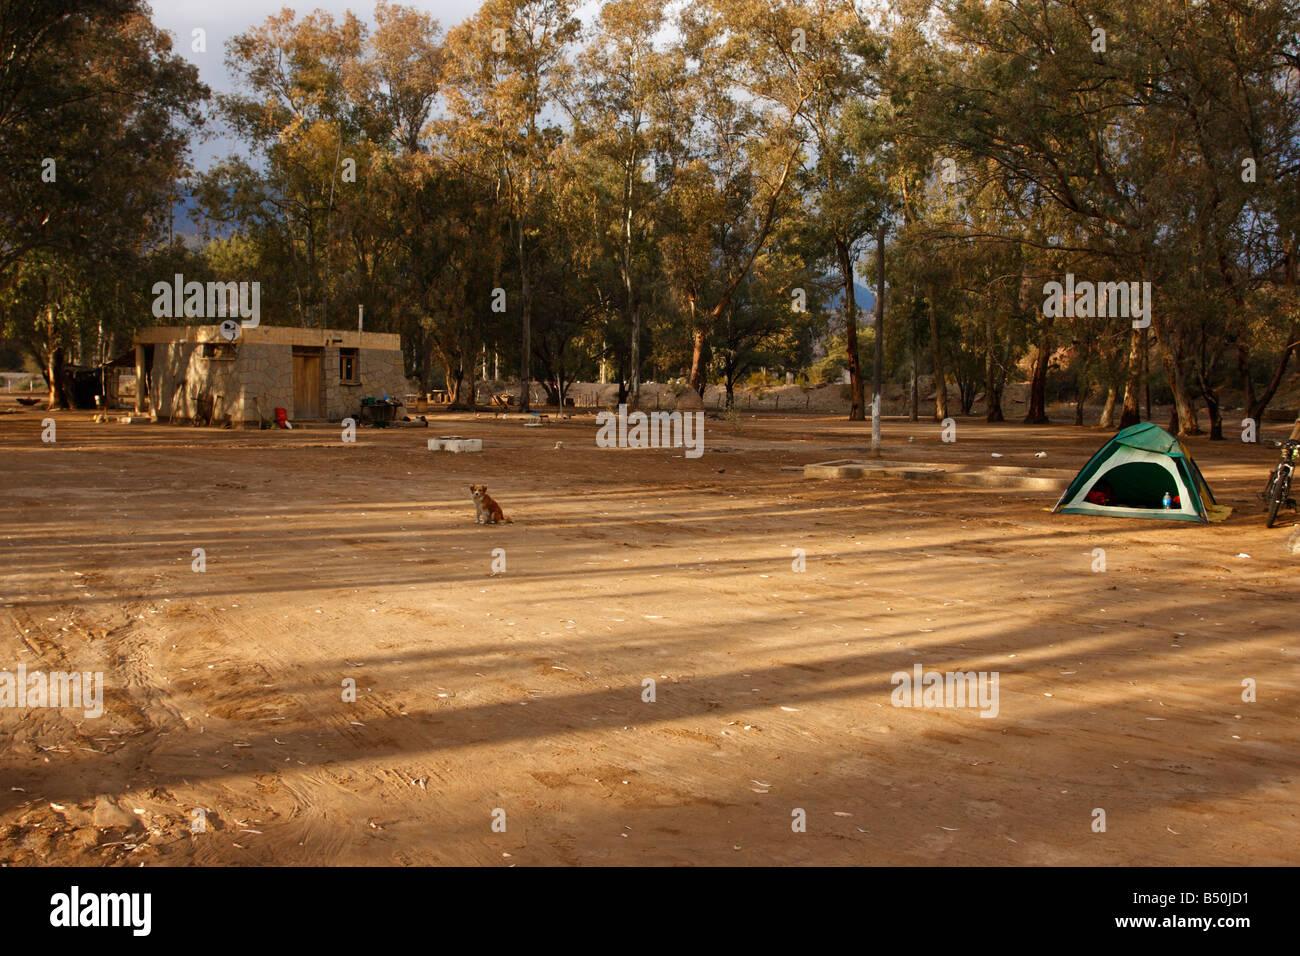 Camping in San Juan province Argentina - Stock Image